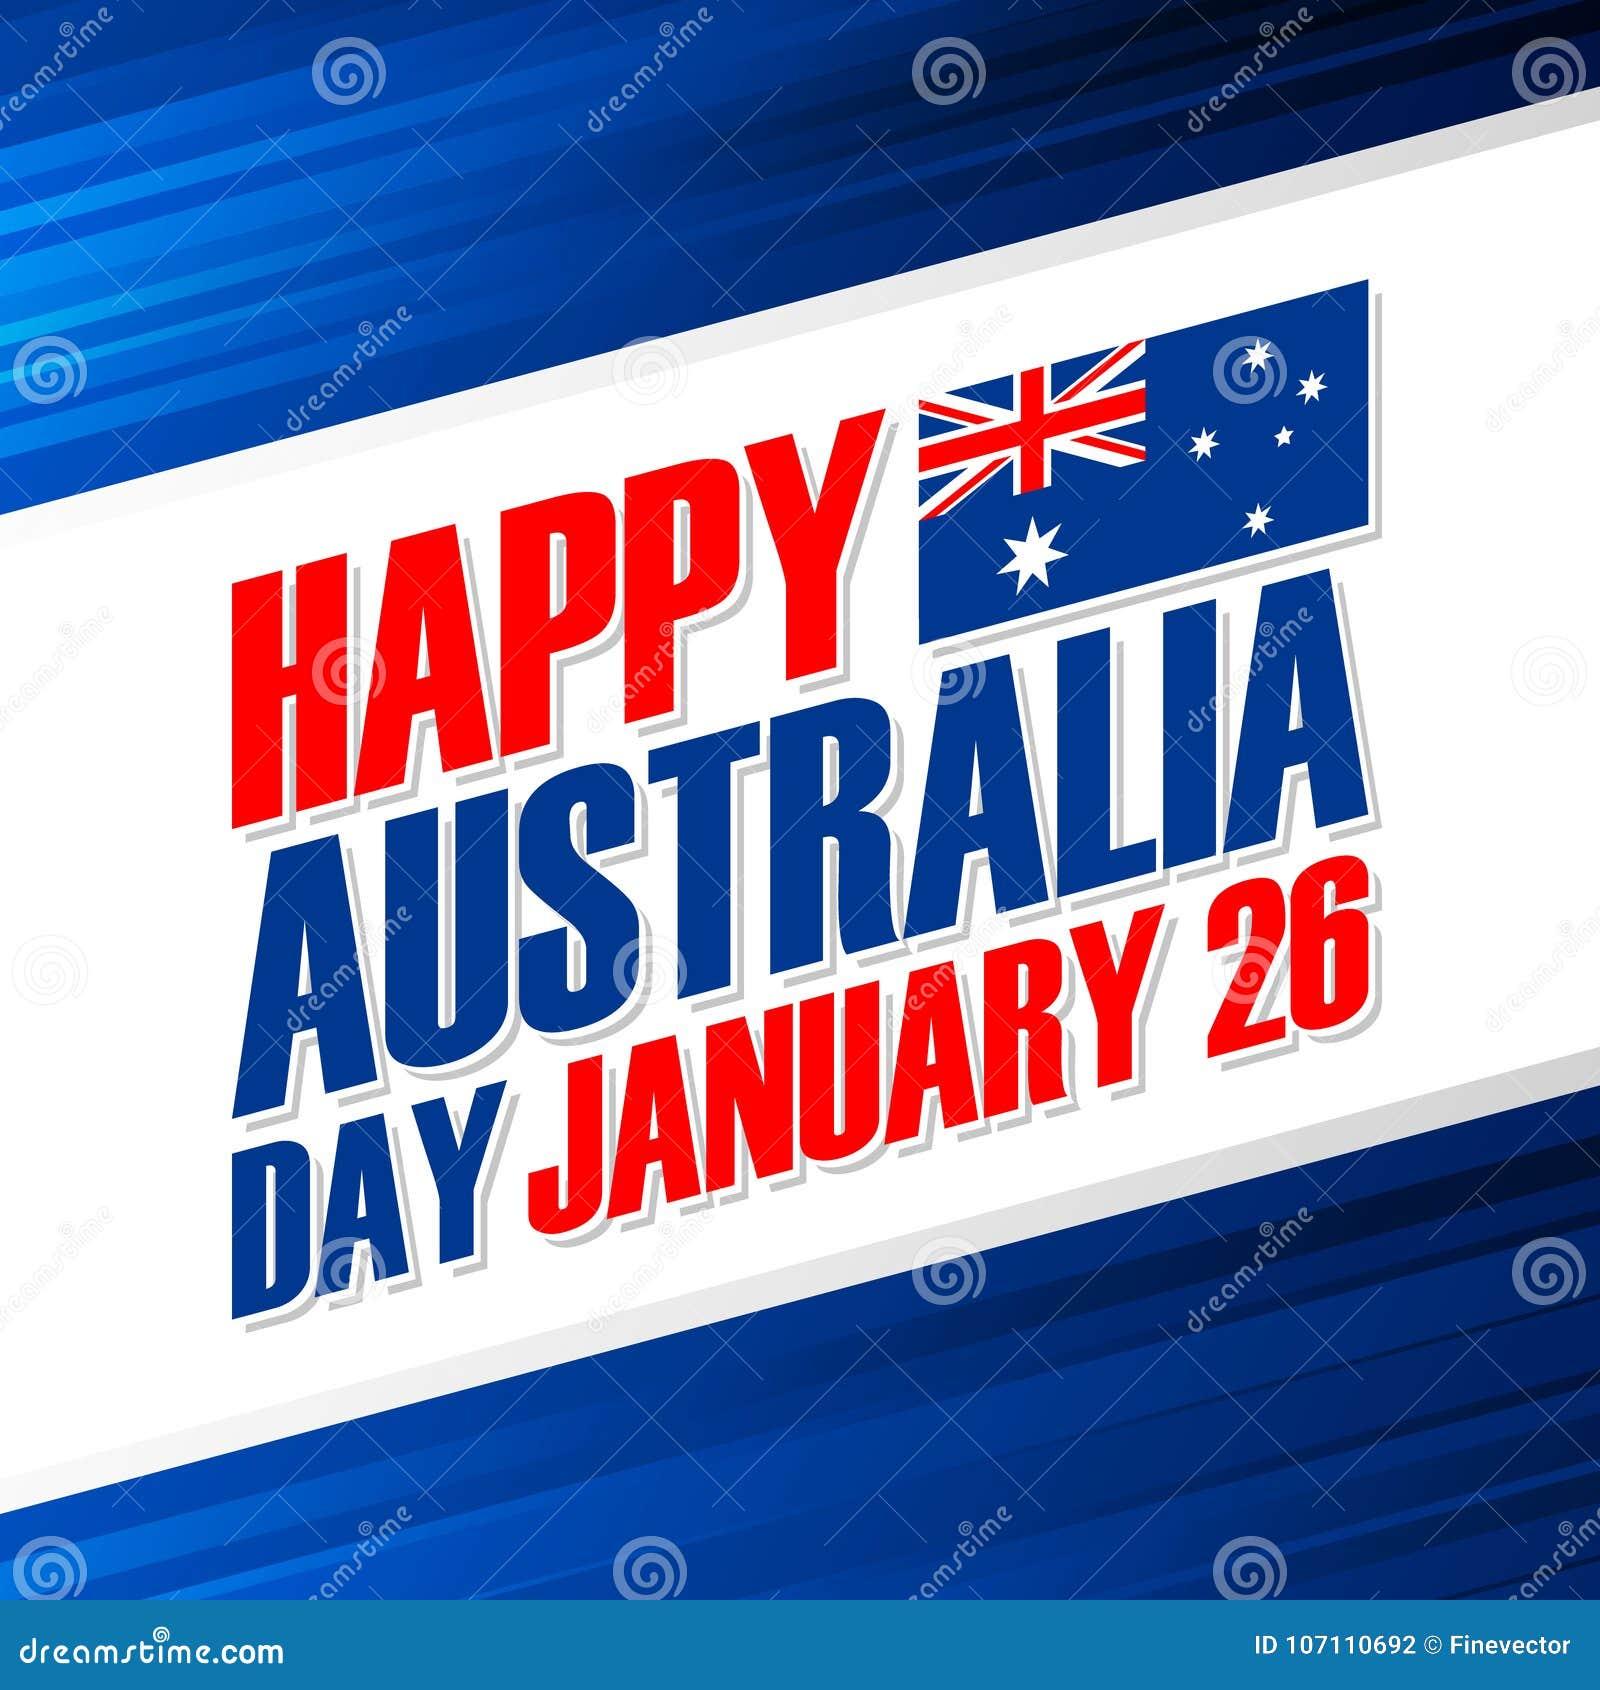 Happy australia day january 26 greeting card stock vector download happy australia day january 26 greeting card stock vector illustration of 26th m4hsunfo